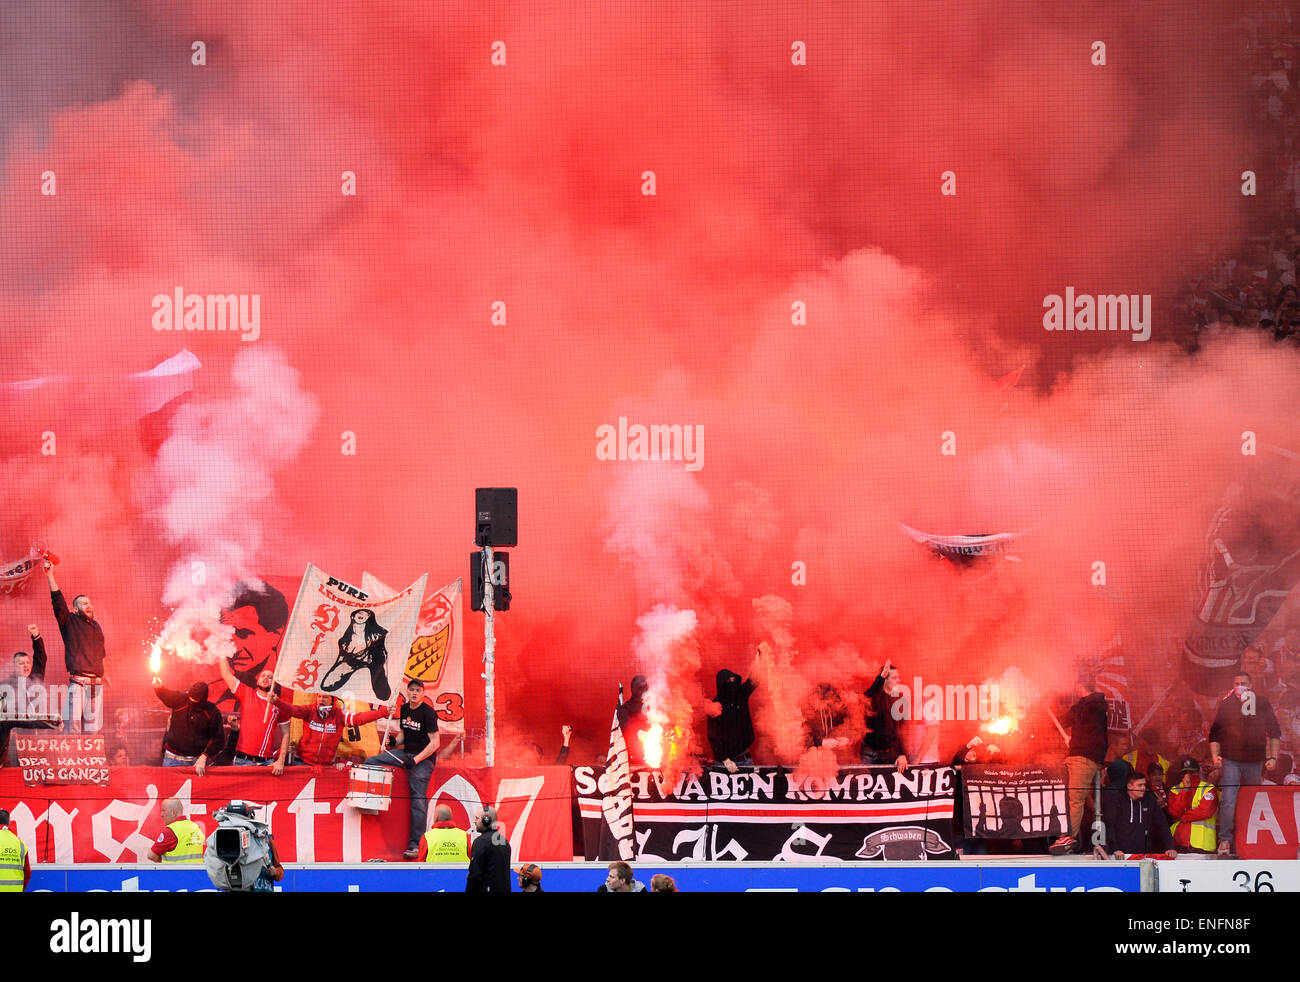 Bengal fireworks, smoke-bombs, Mercedes-Benz Arena, Stuttgart, Baden-Württemberg, Germany - Stock Image